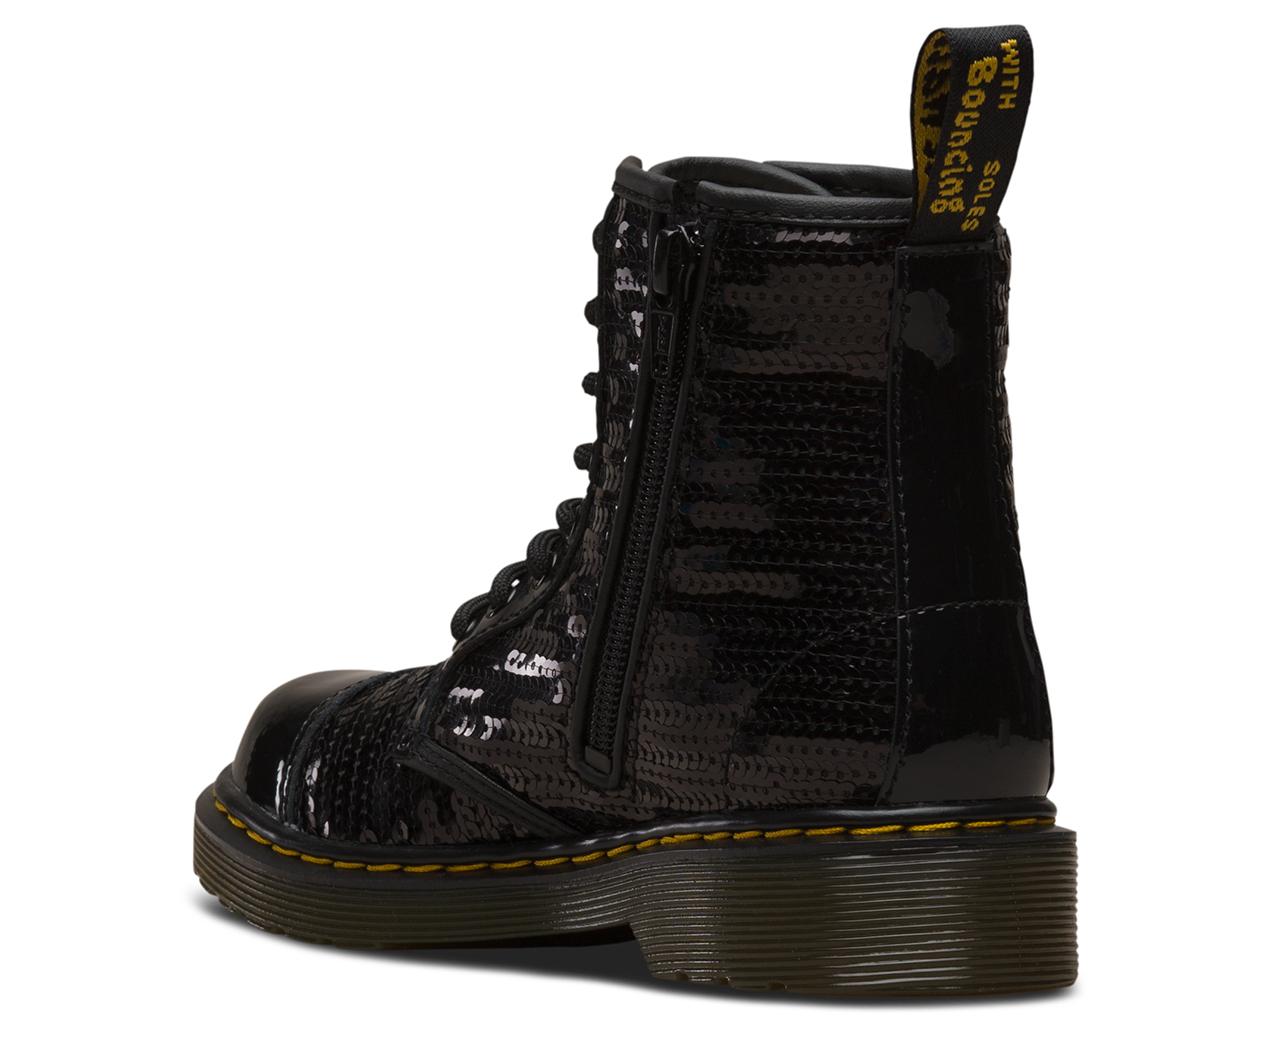 cef6748525b3 Footwear Dr.Martens Kids 1460 Pooch Sequin Patent Lamper Sequins Boots